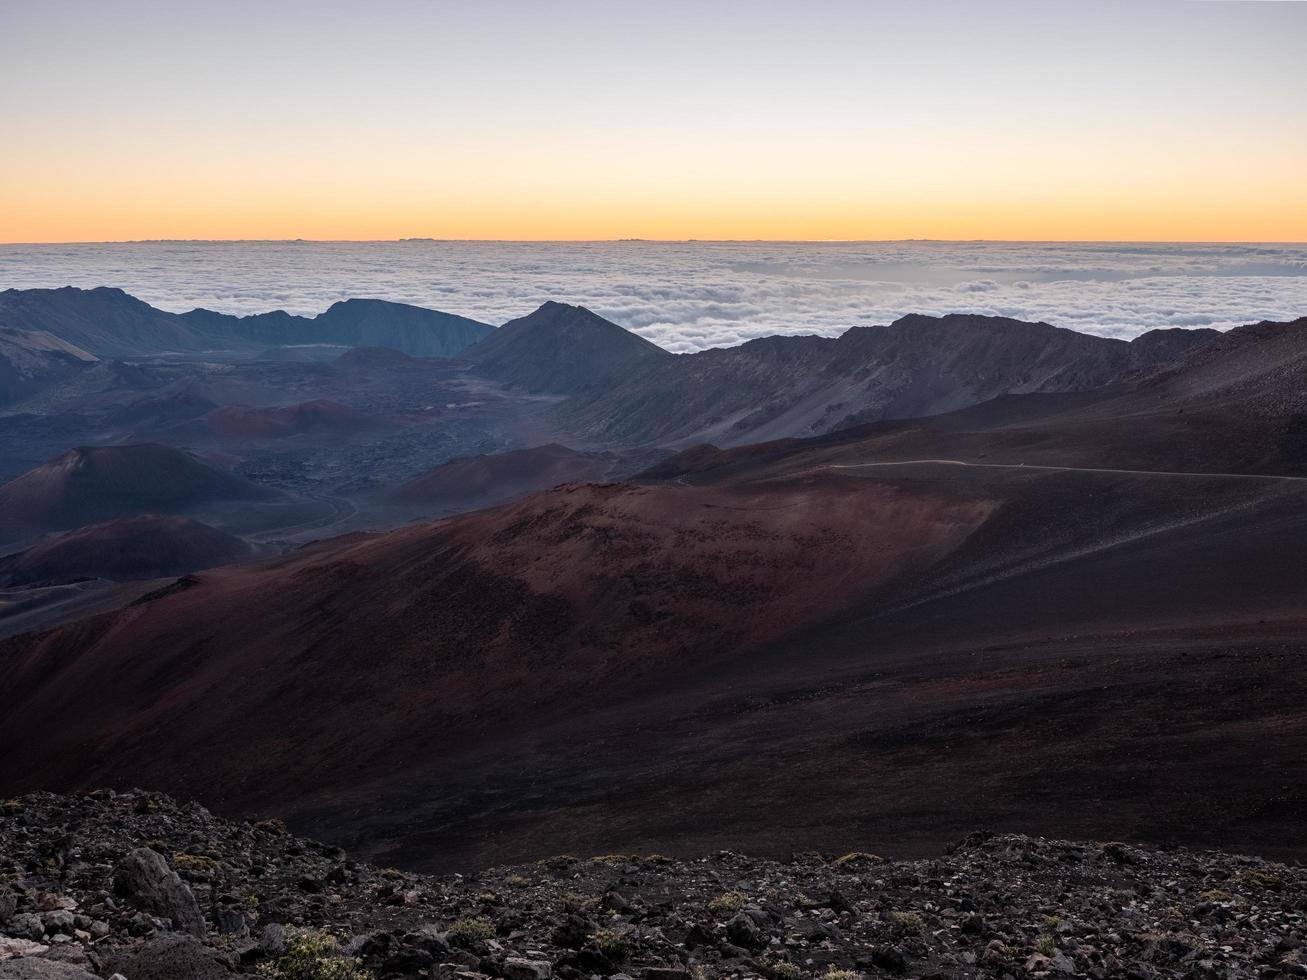 Rocky Canyon während des Sonnenuntergangs foto